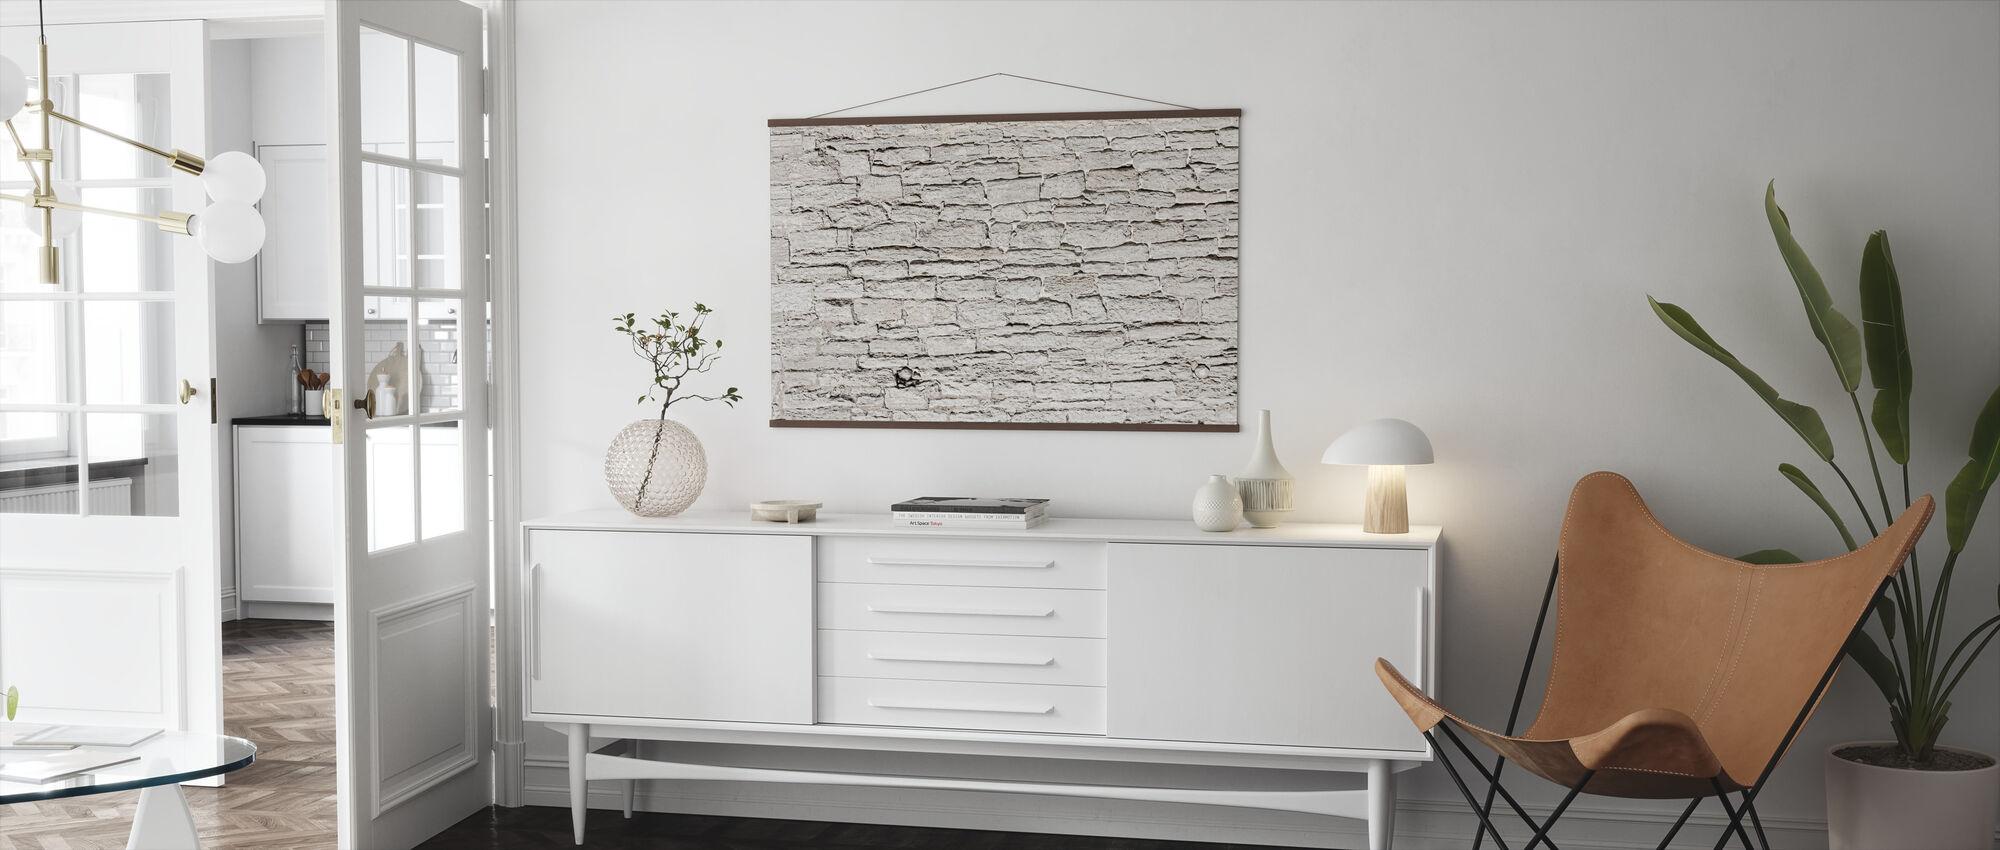 Light Grey Stone Wall - Poster - Living Room